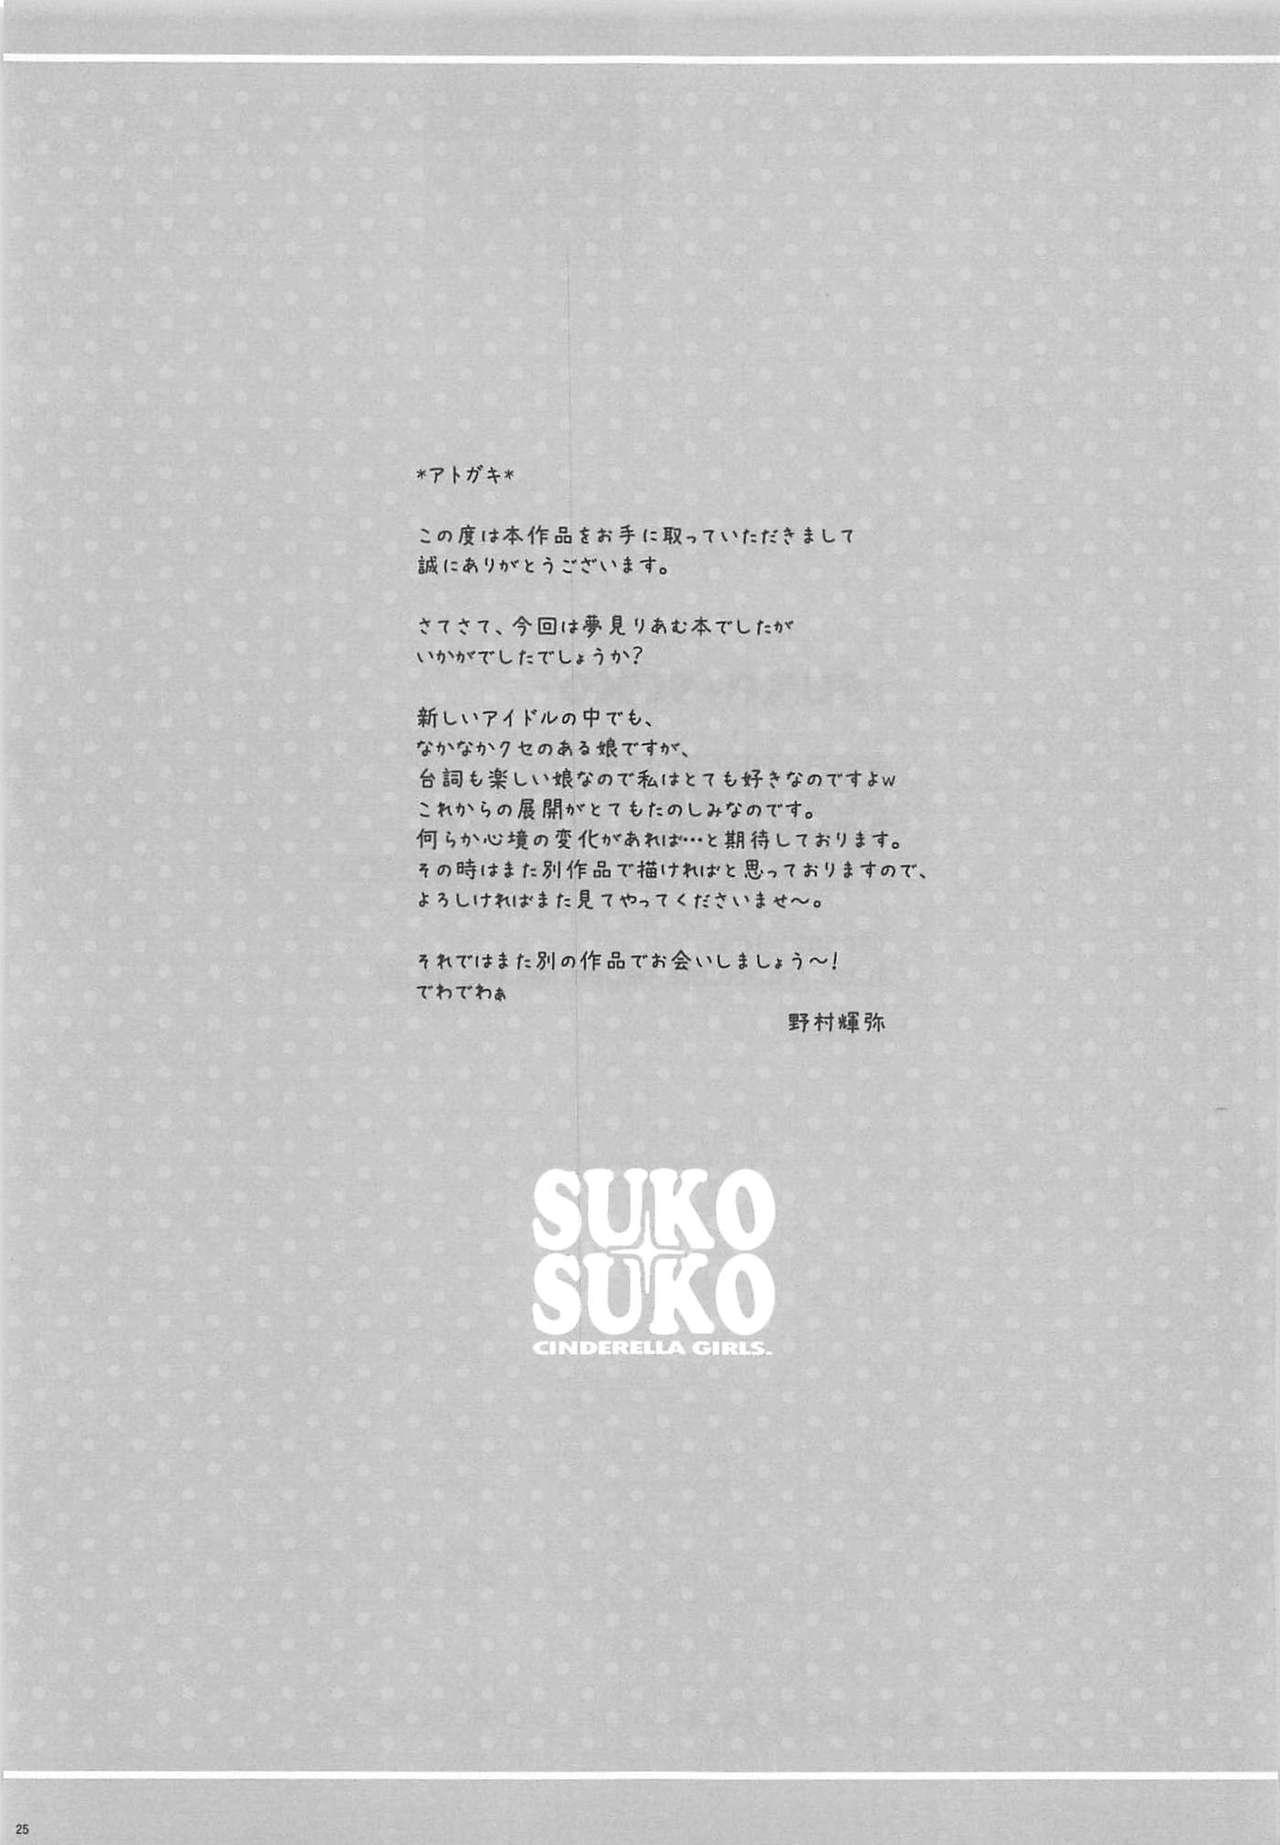 SUKO + SUKO 24